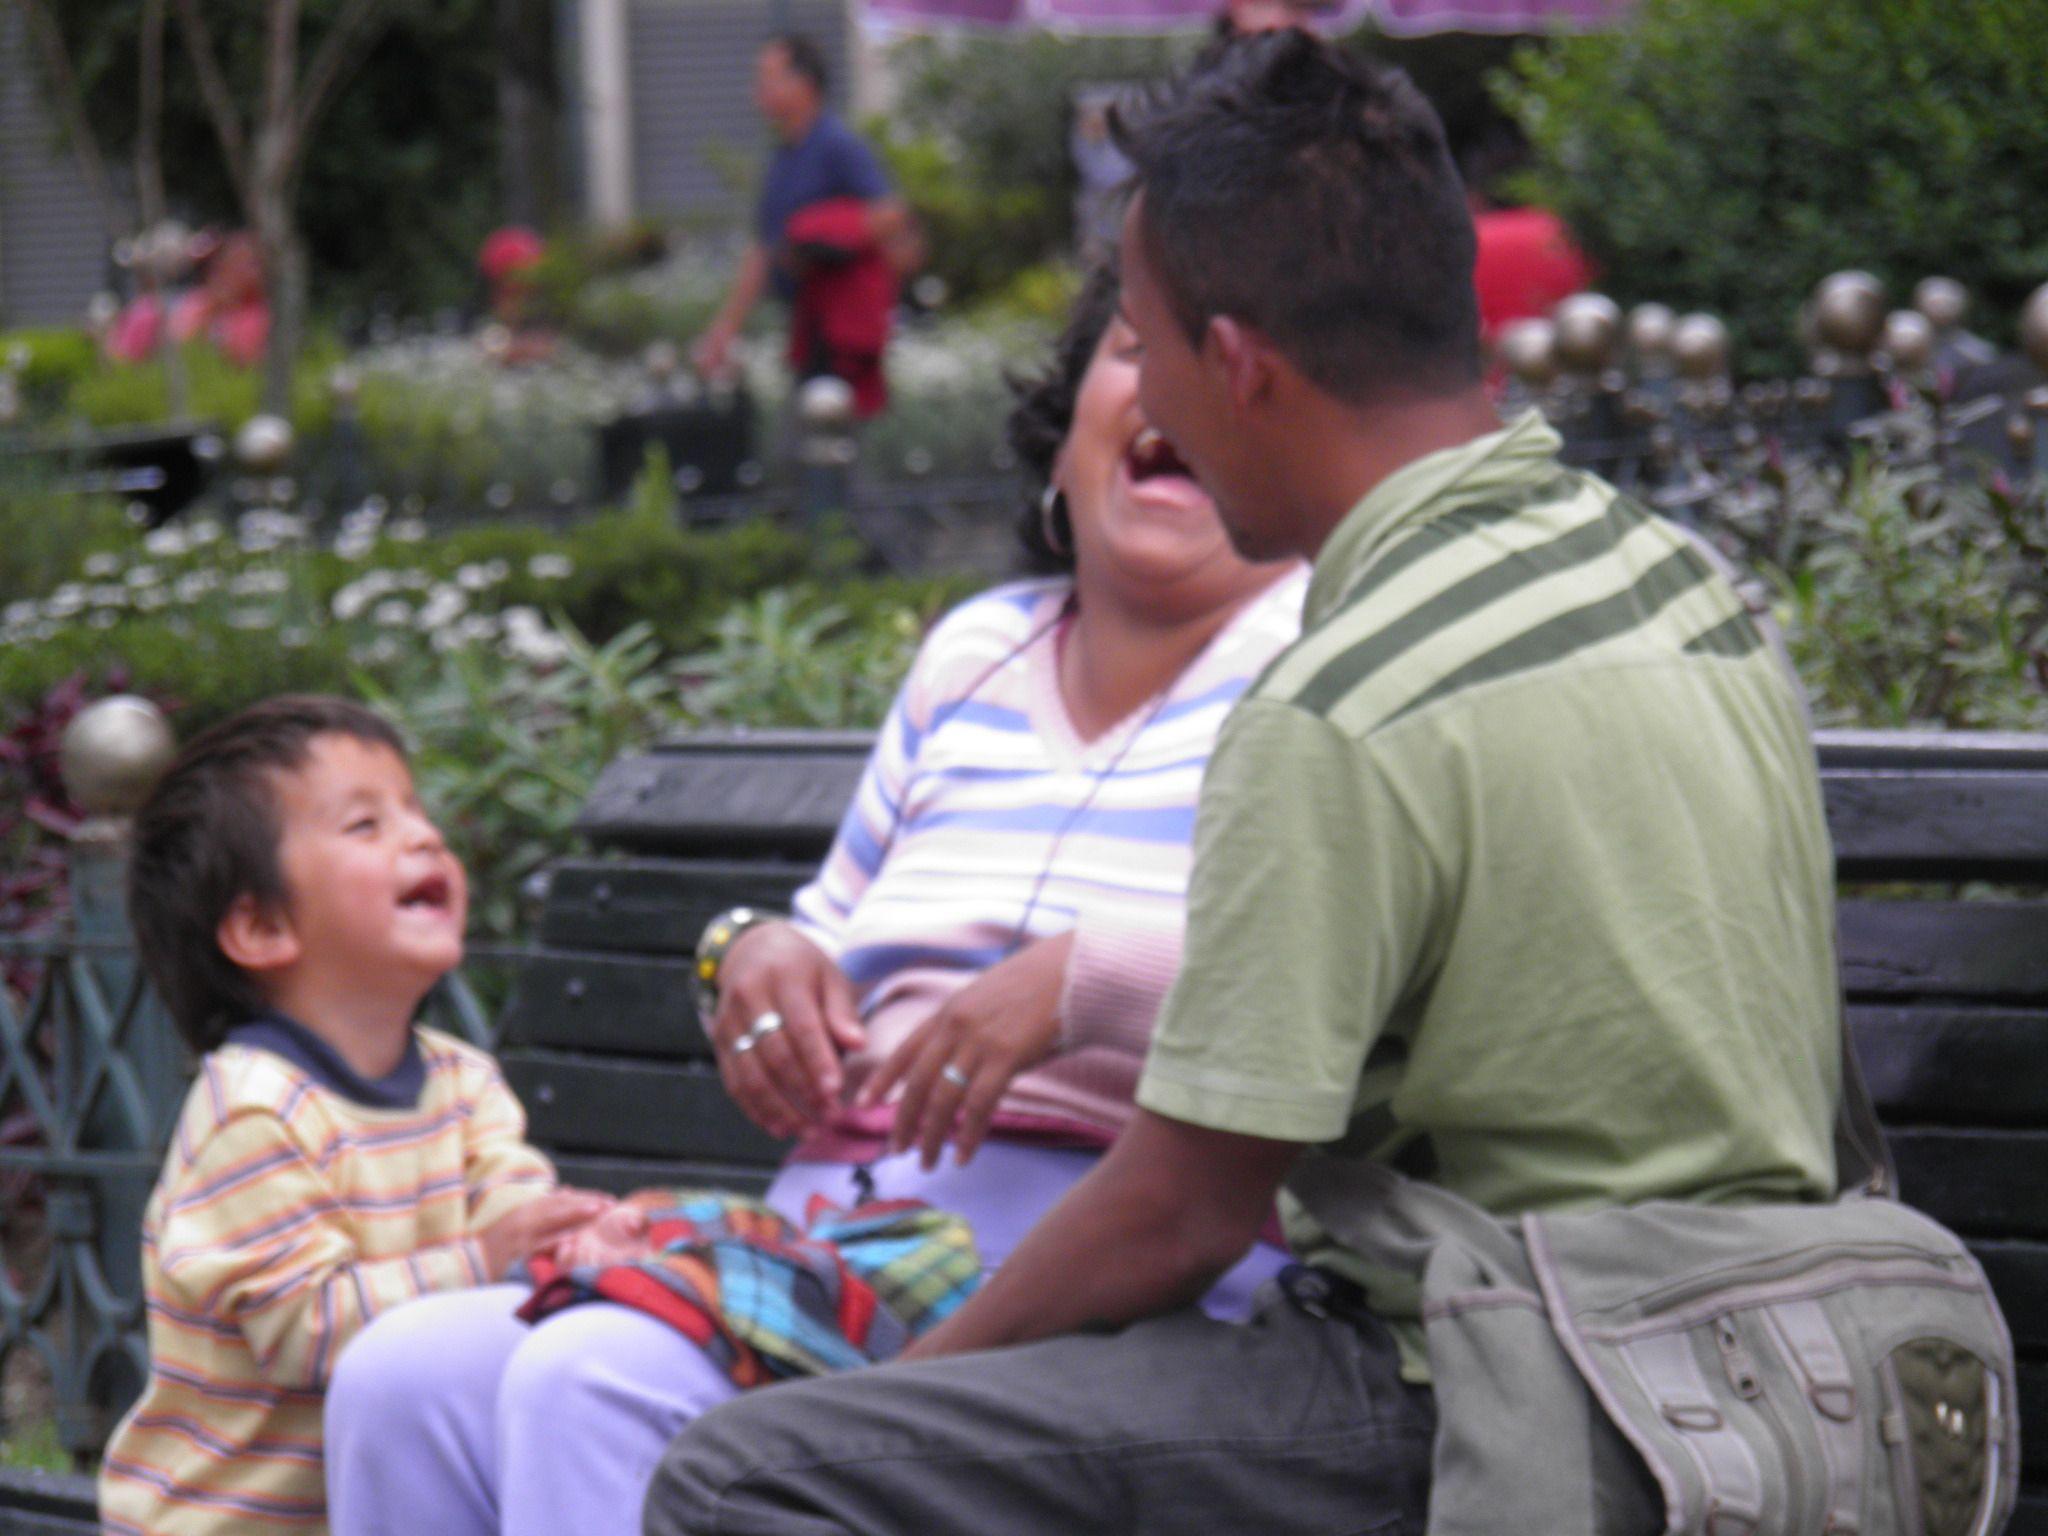 IN CUENCA IT'S FAMILY FAMILY FAMILY